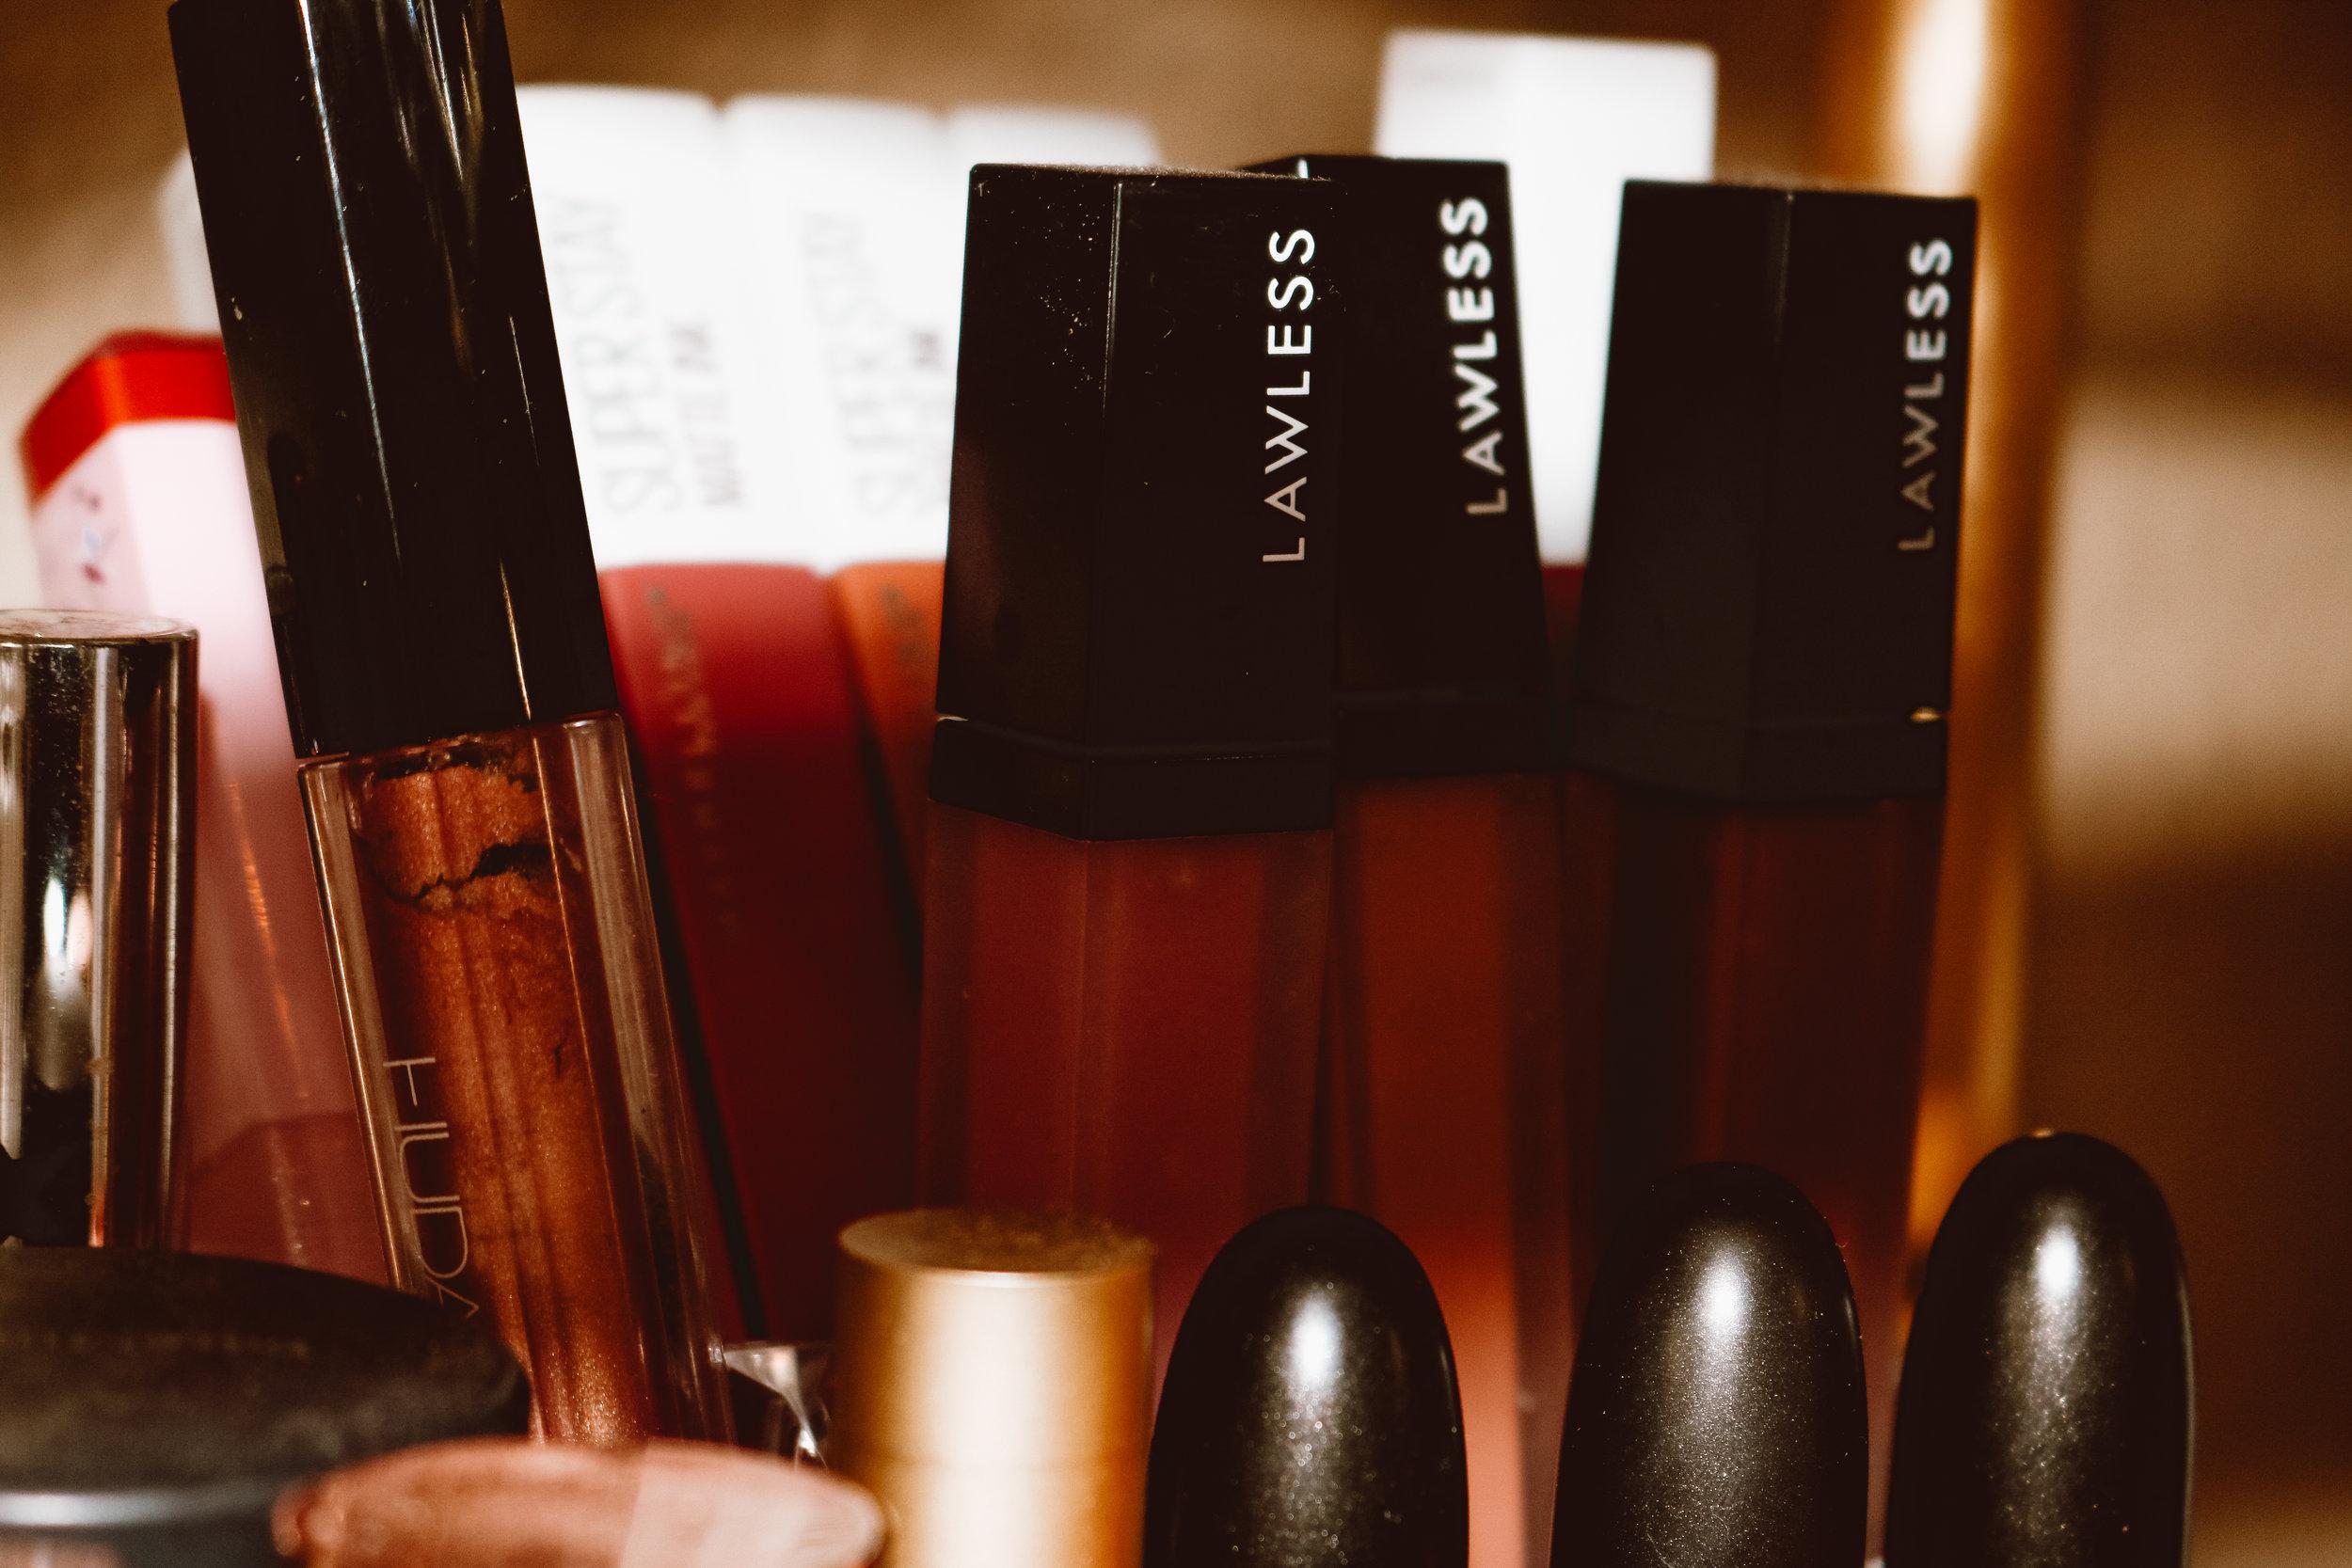 lawless-lipstick-swatches-4.jpg